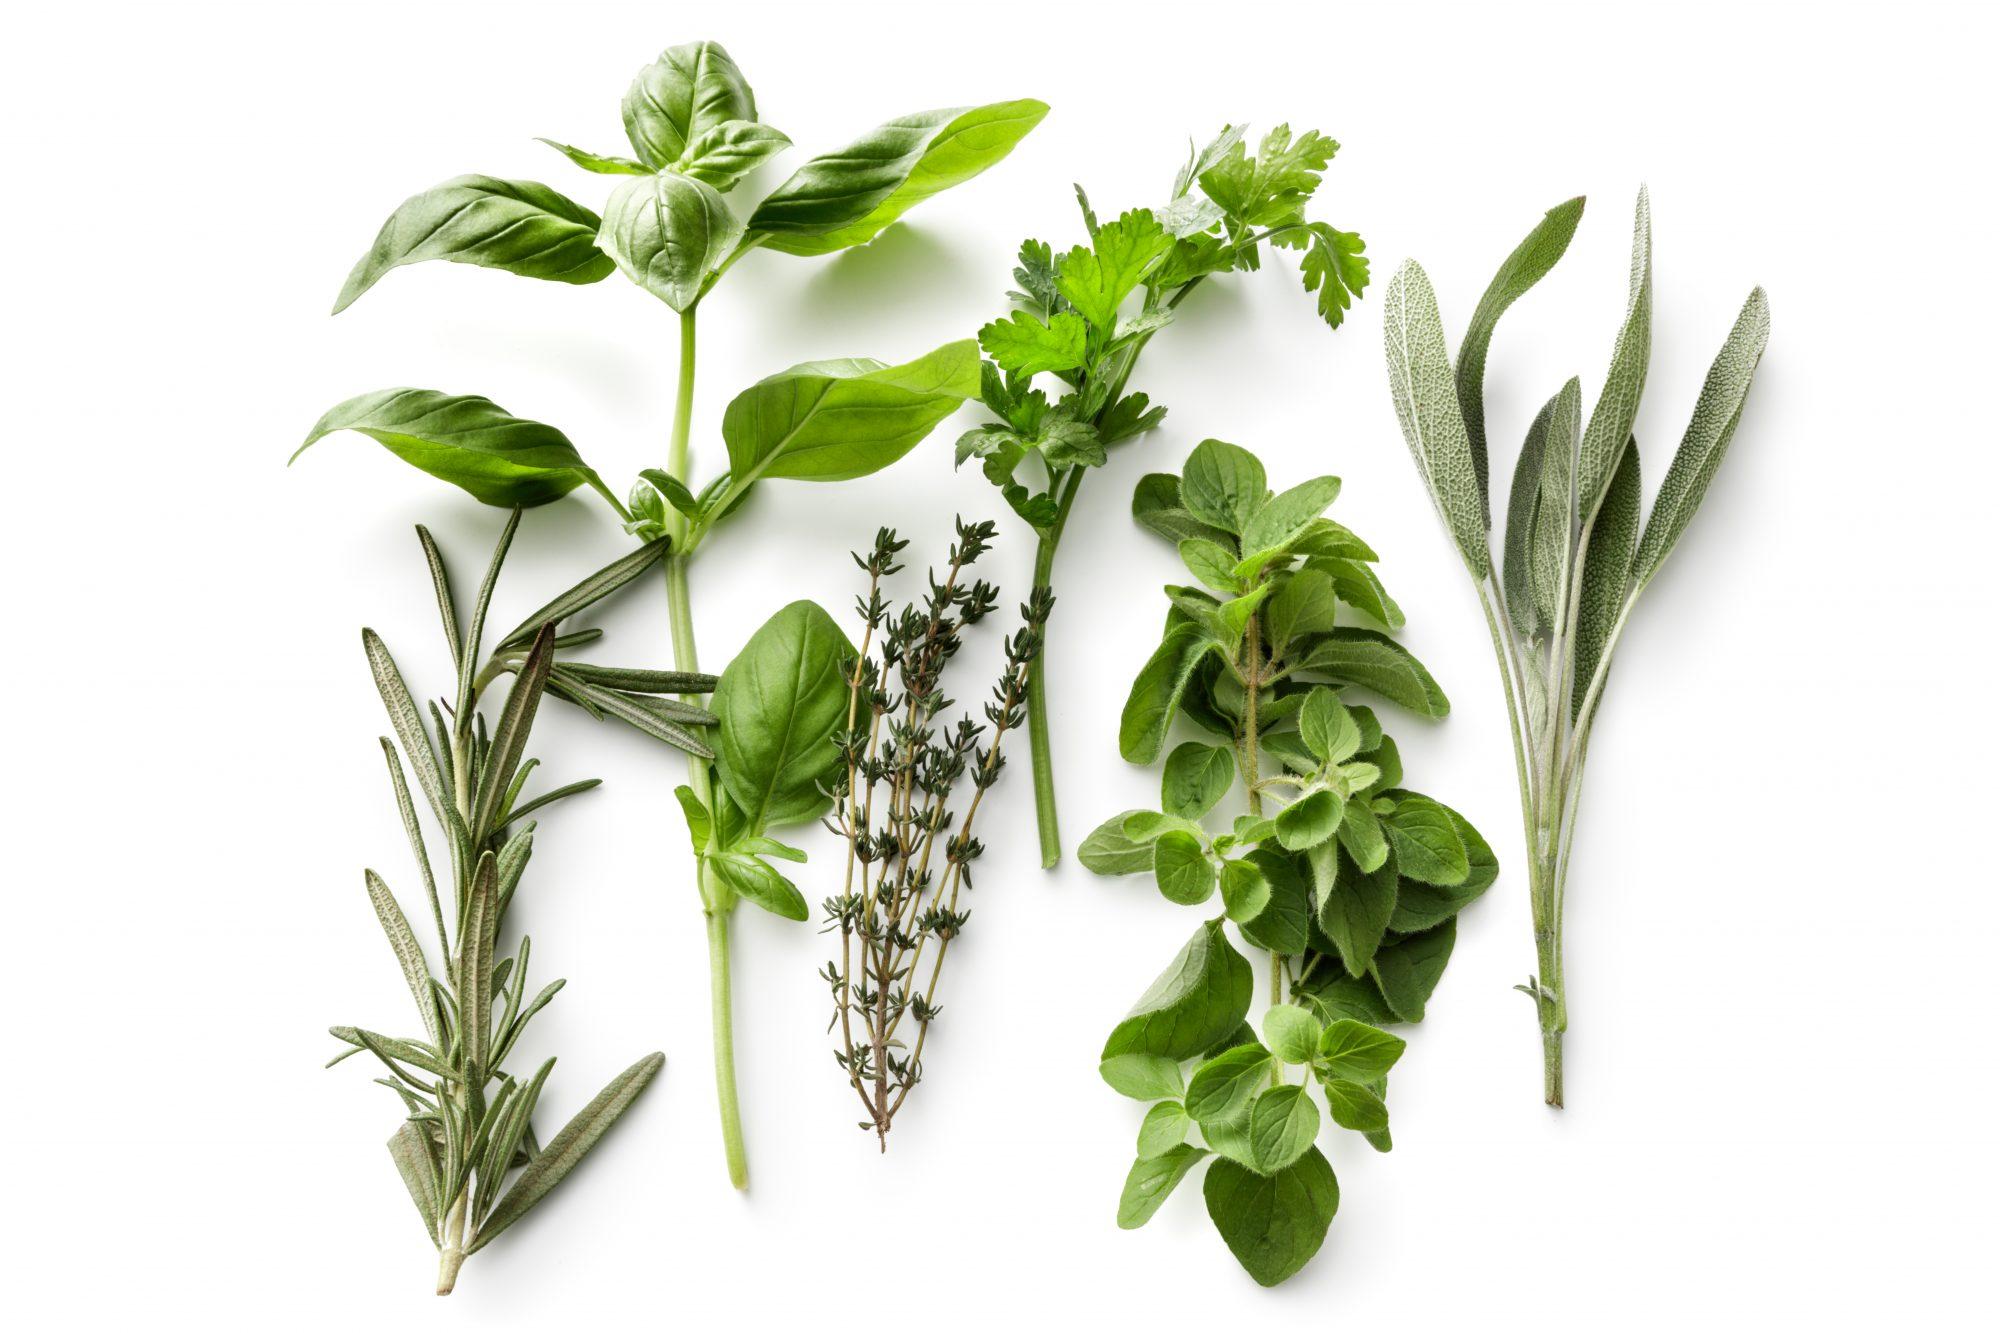 Herbs Getty 7/13/20